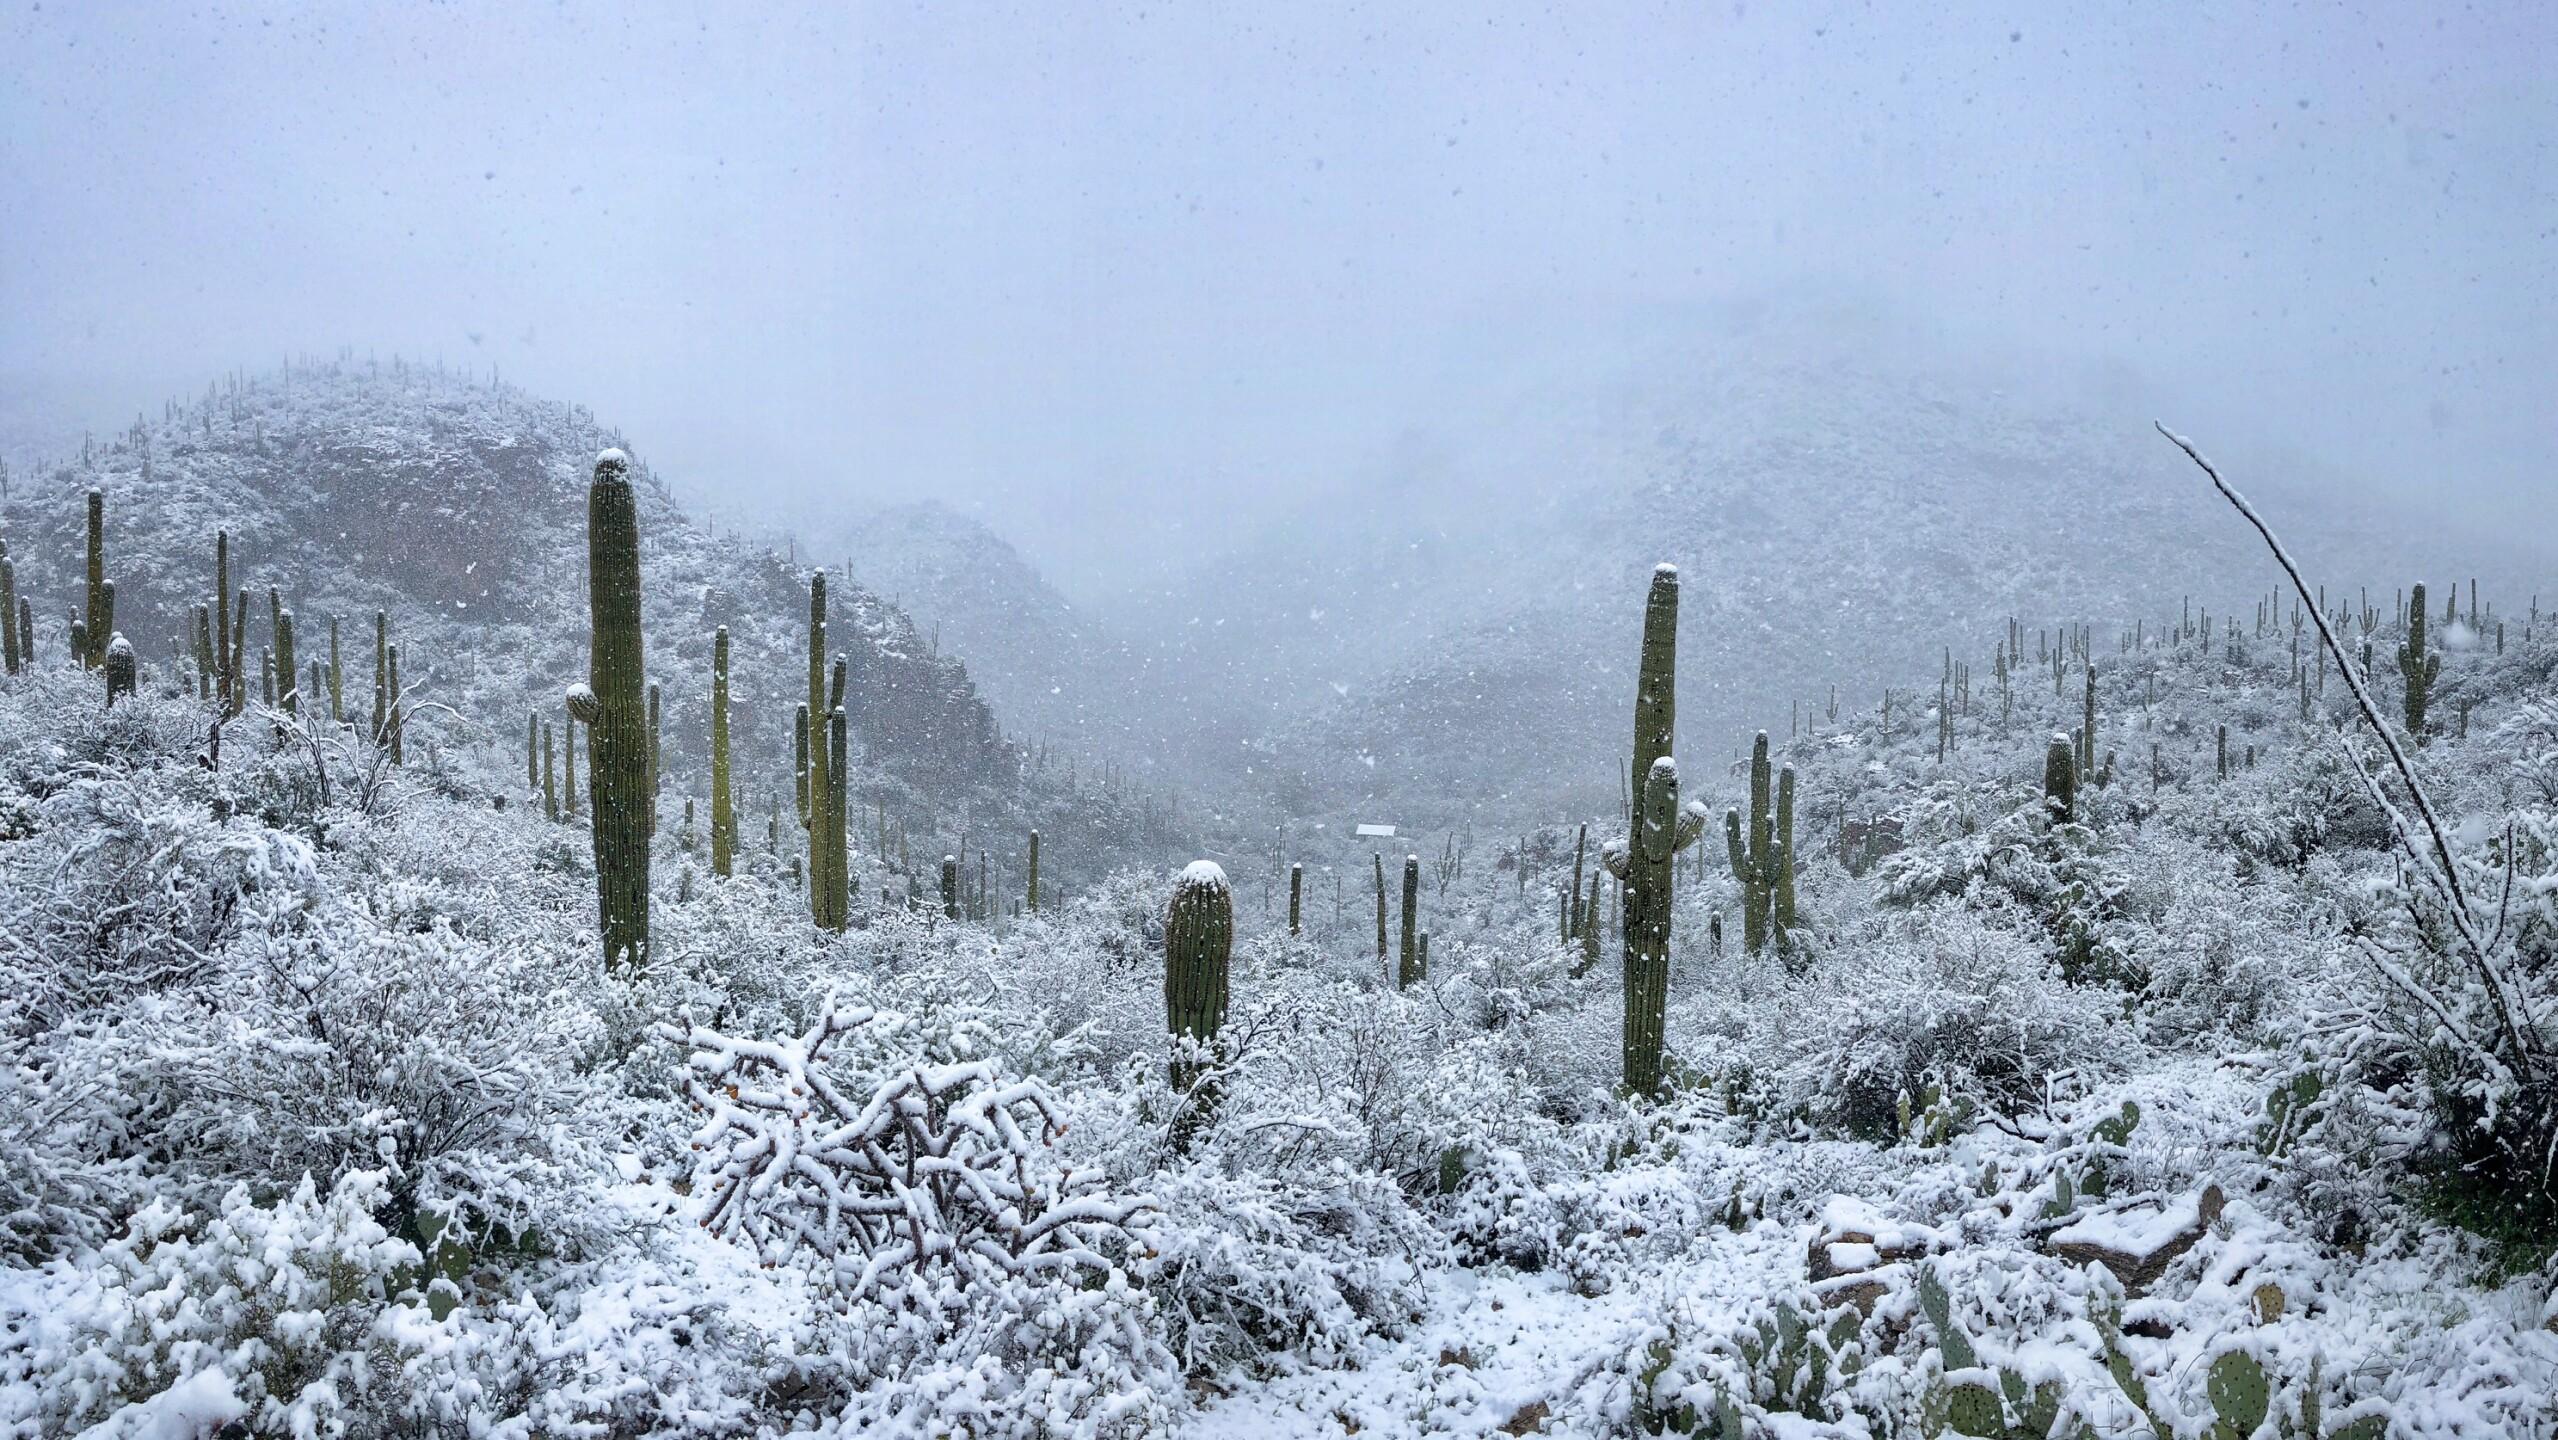 joseph-cyr-this-morning-around-Sabino-Canyon-5.jpg